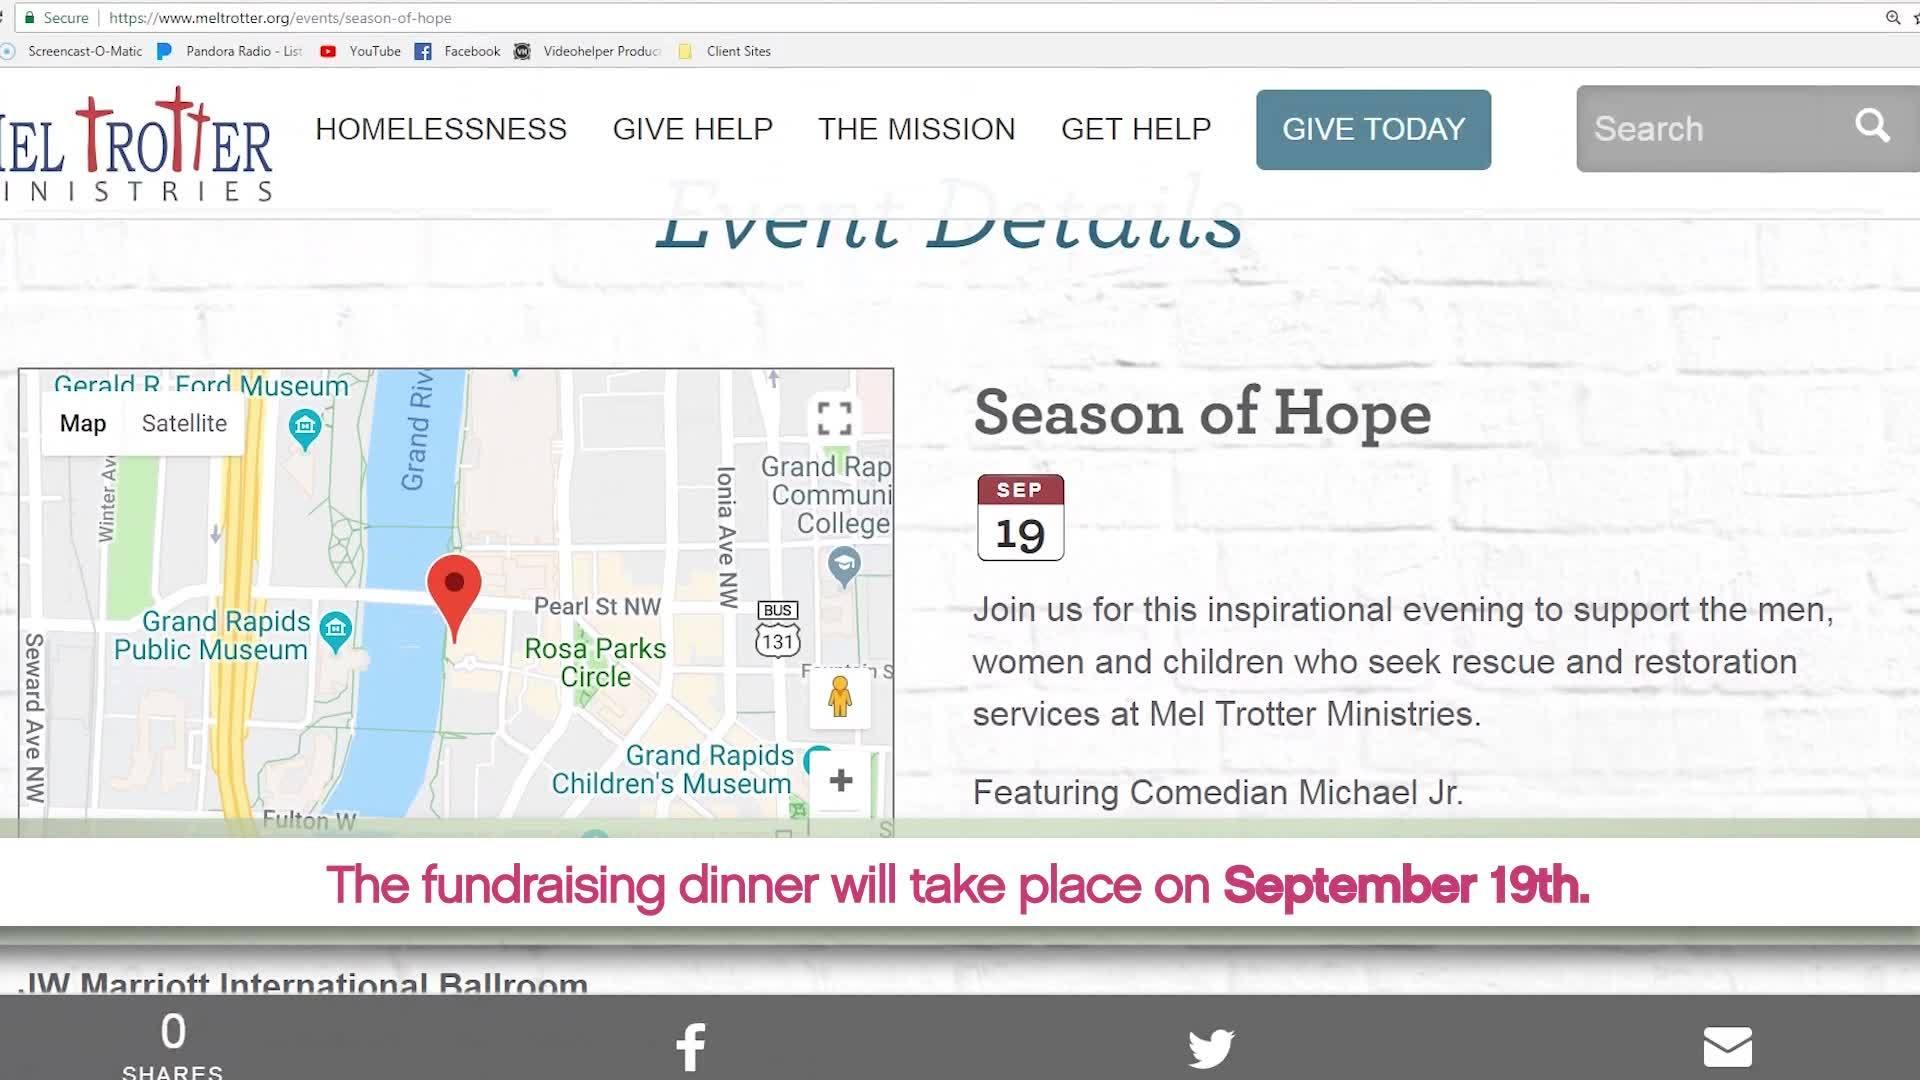 Mel_Trotter_Ministries__Season_of_Hope_0_20180813172125